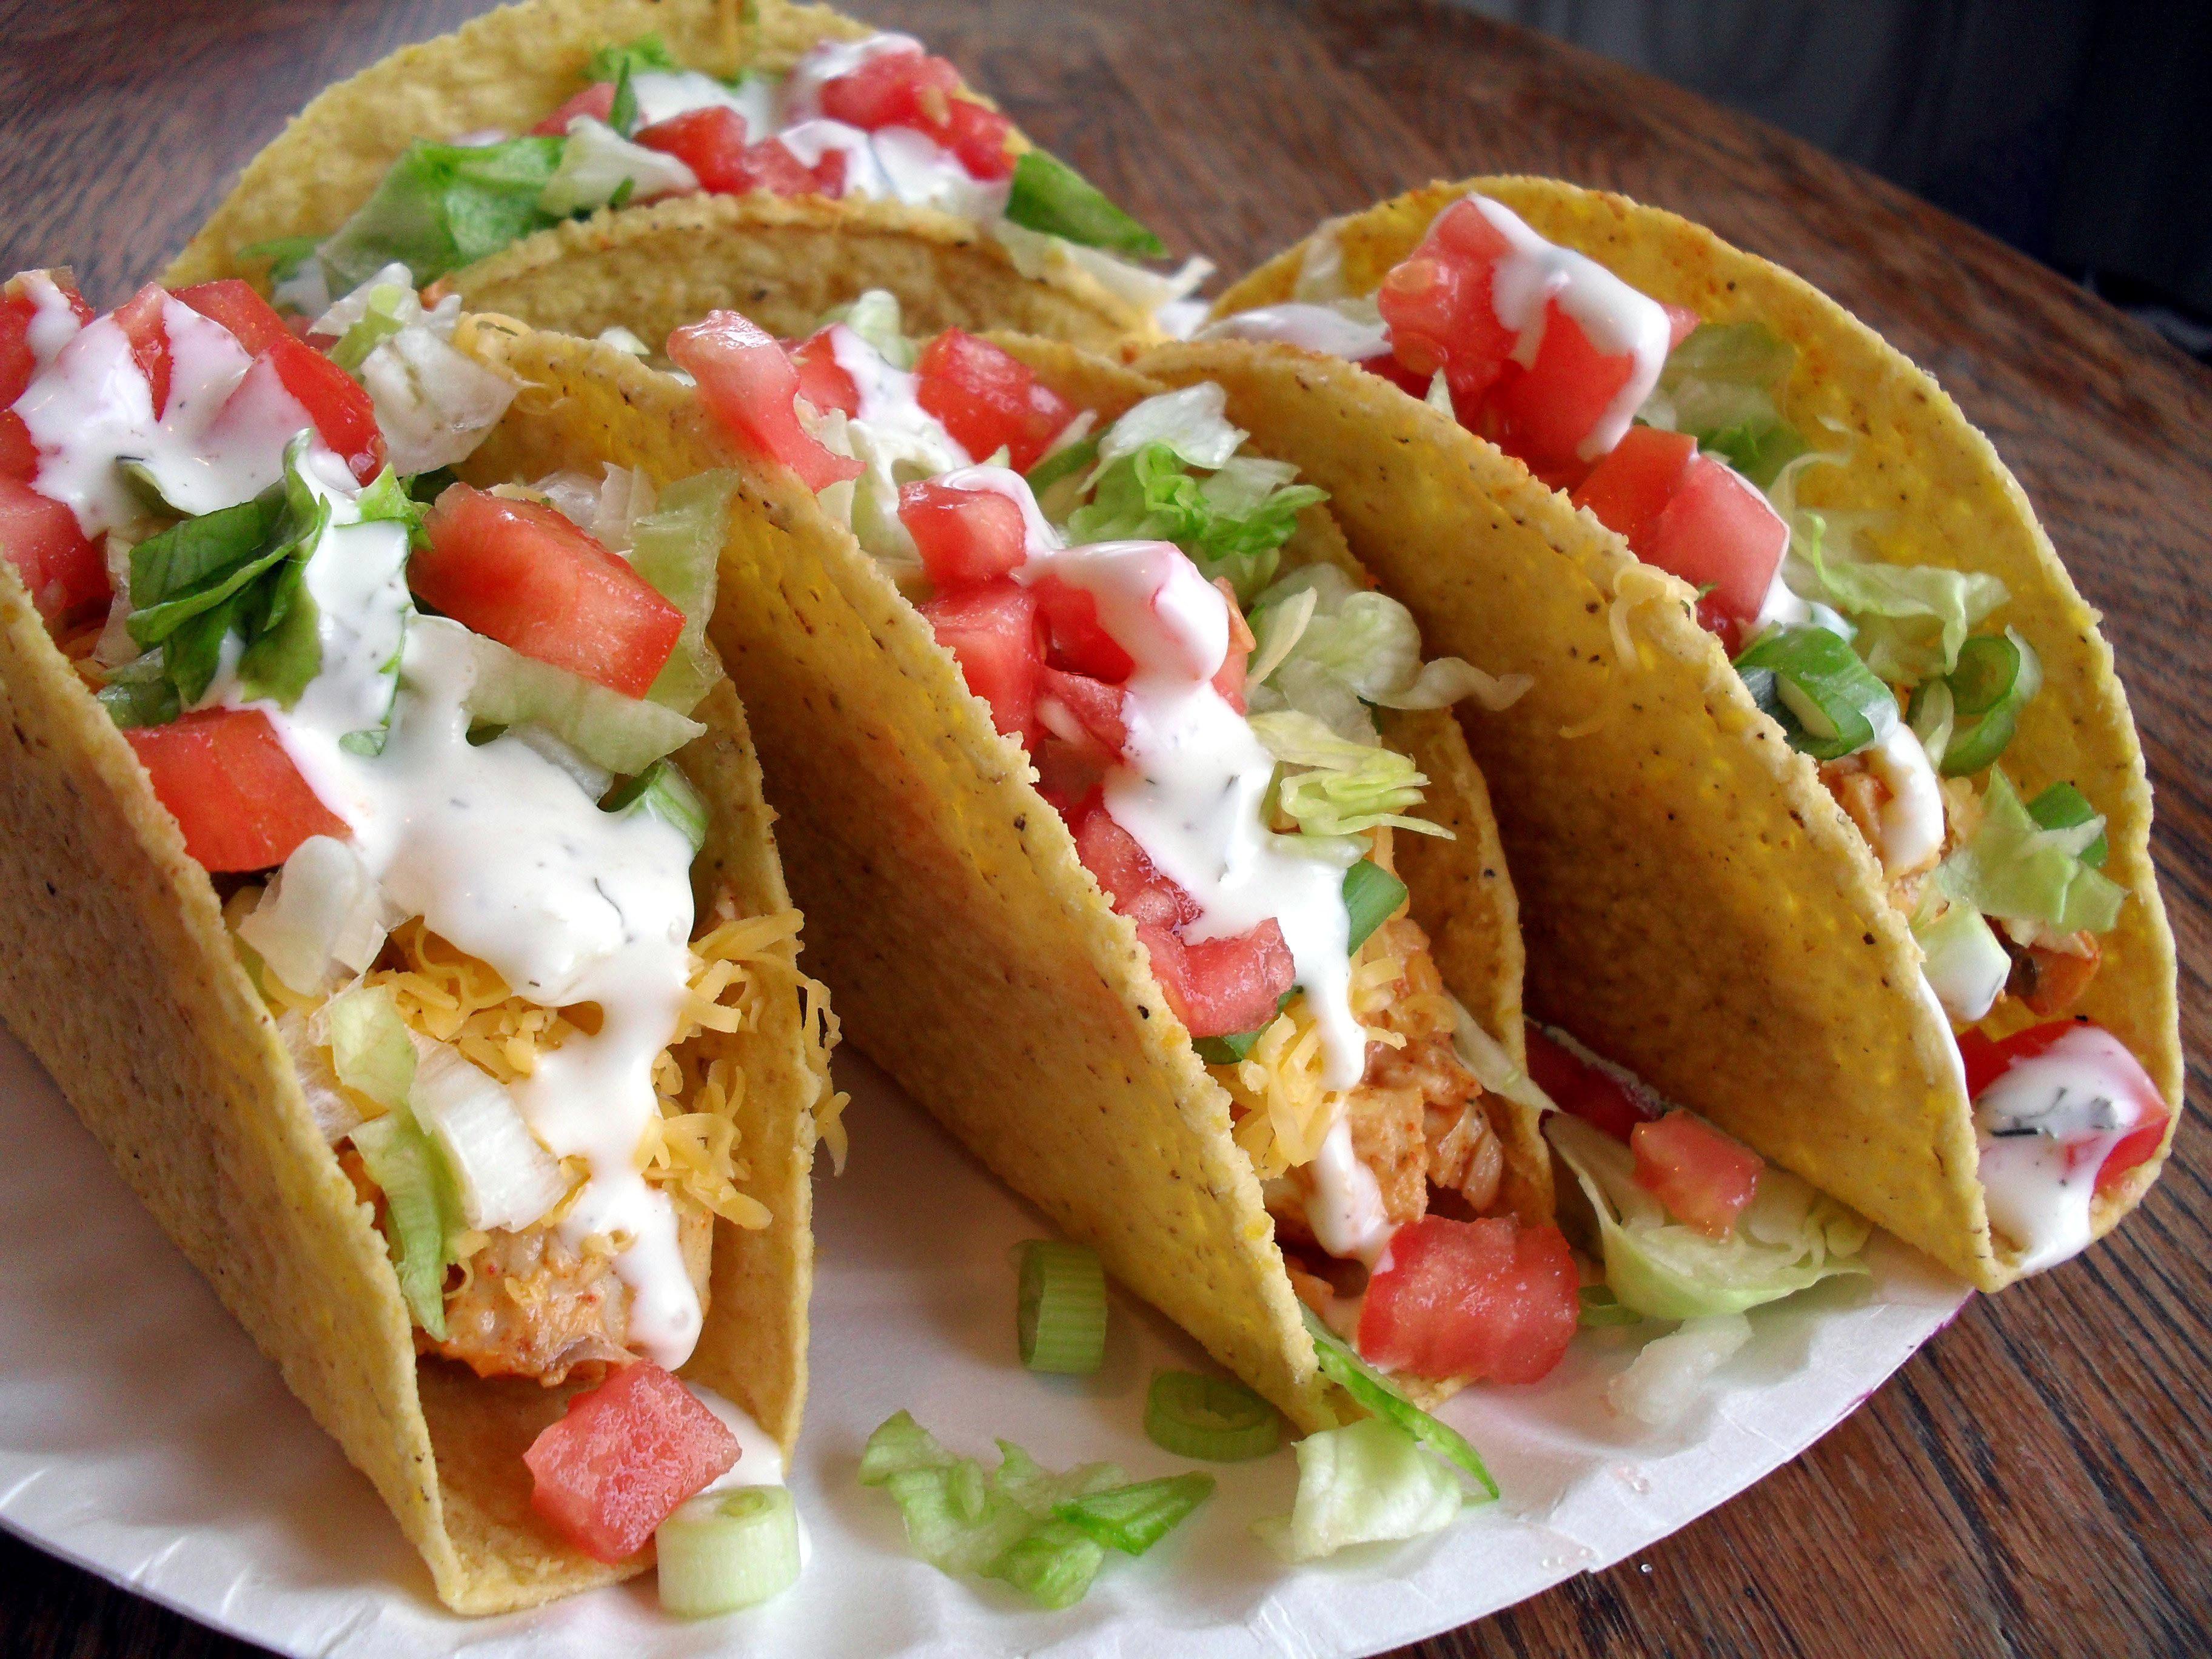 Chicken ranch tacos veronica 39 s cornucopia for Best fish taco recipe in the world